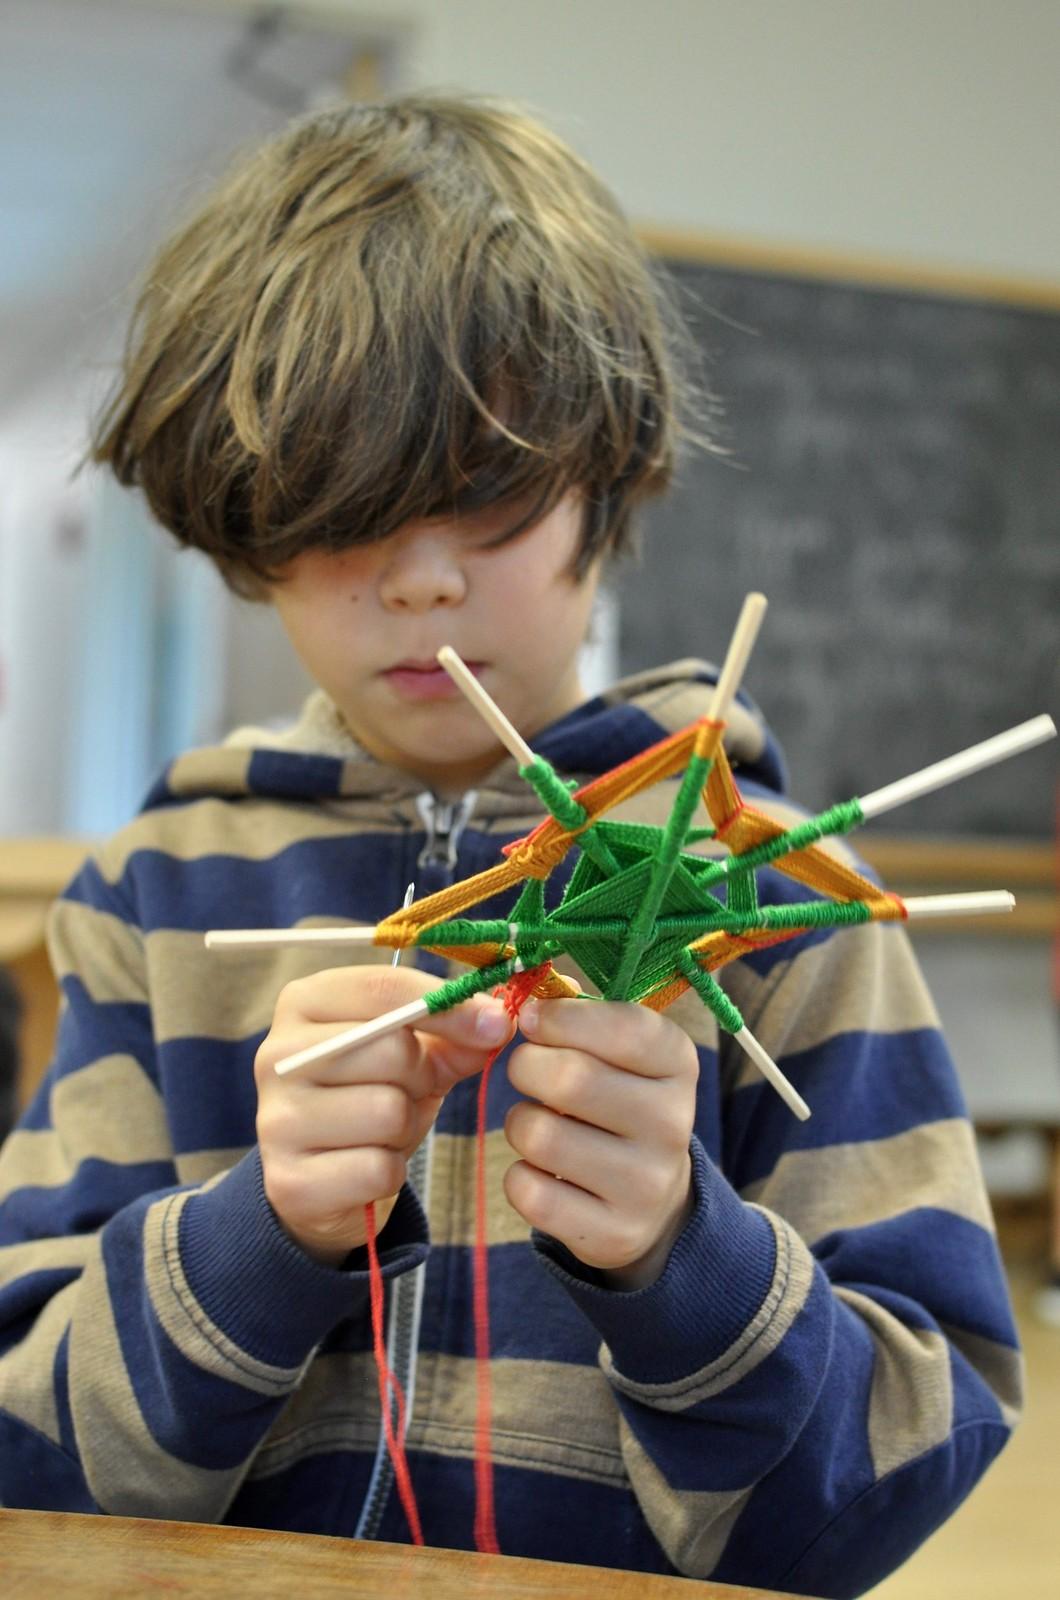 Children For Daz Studio And Poser: The Benefits Of Handwork For Children